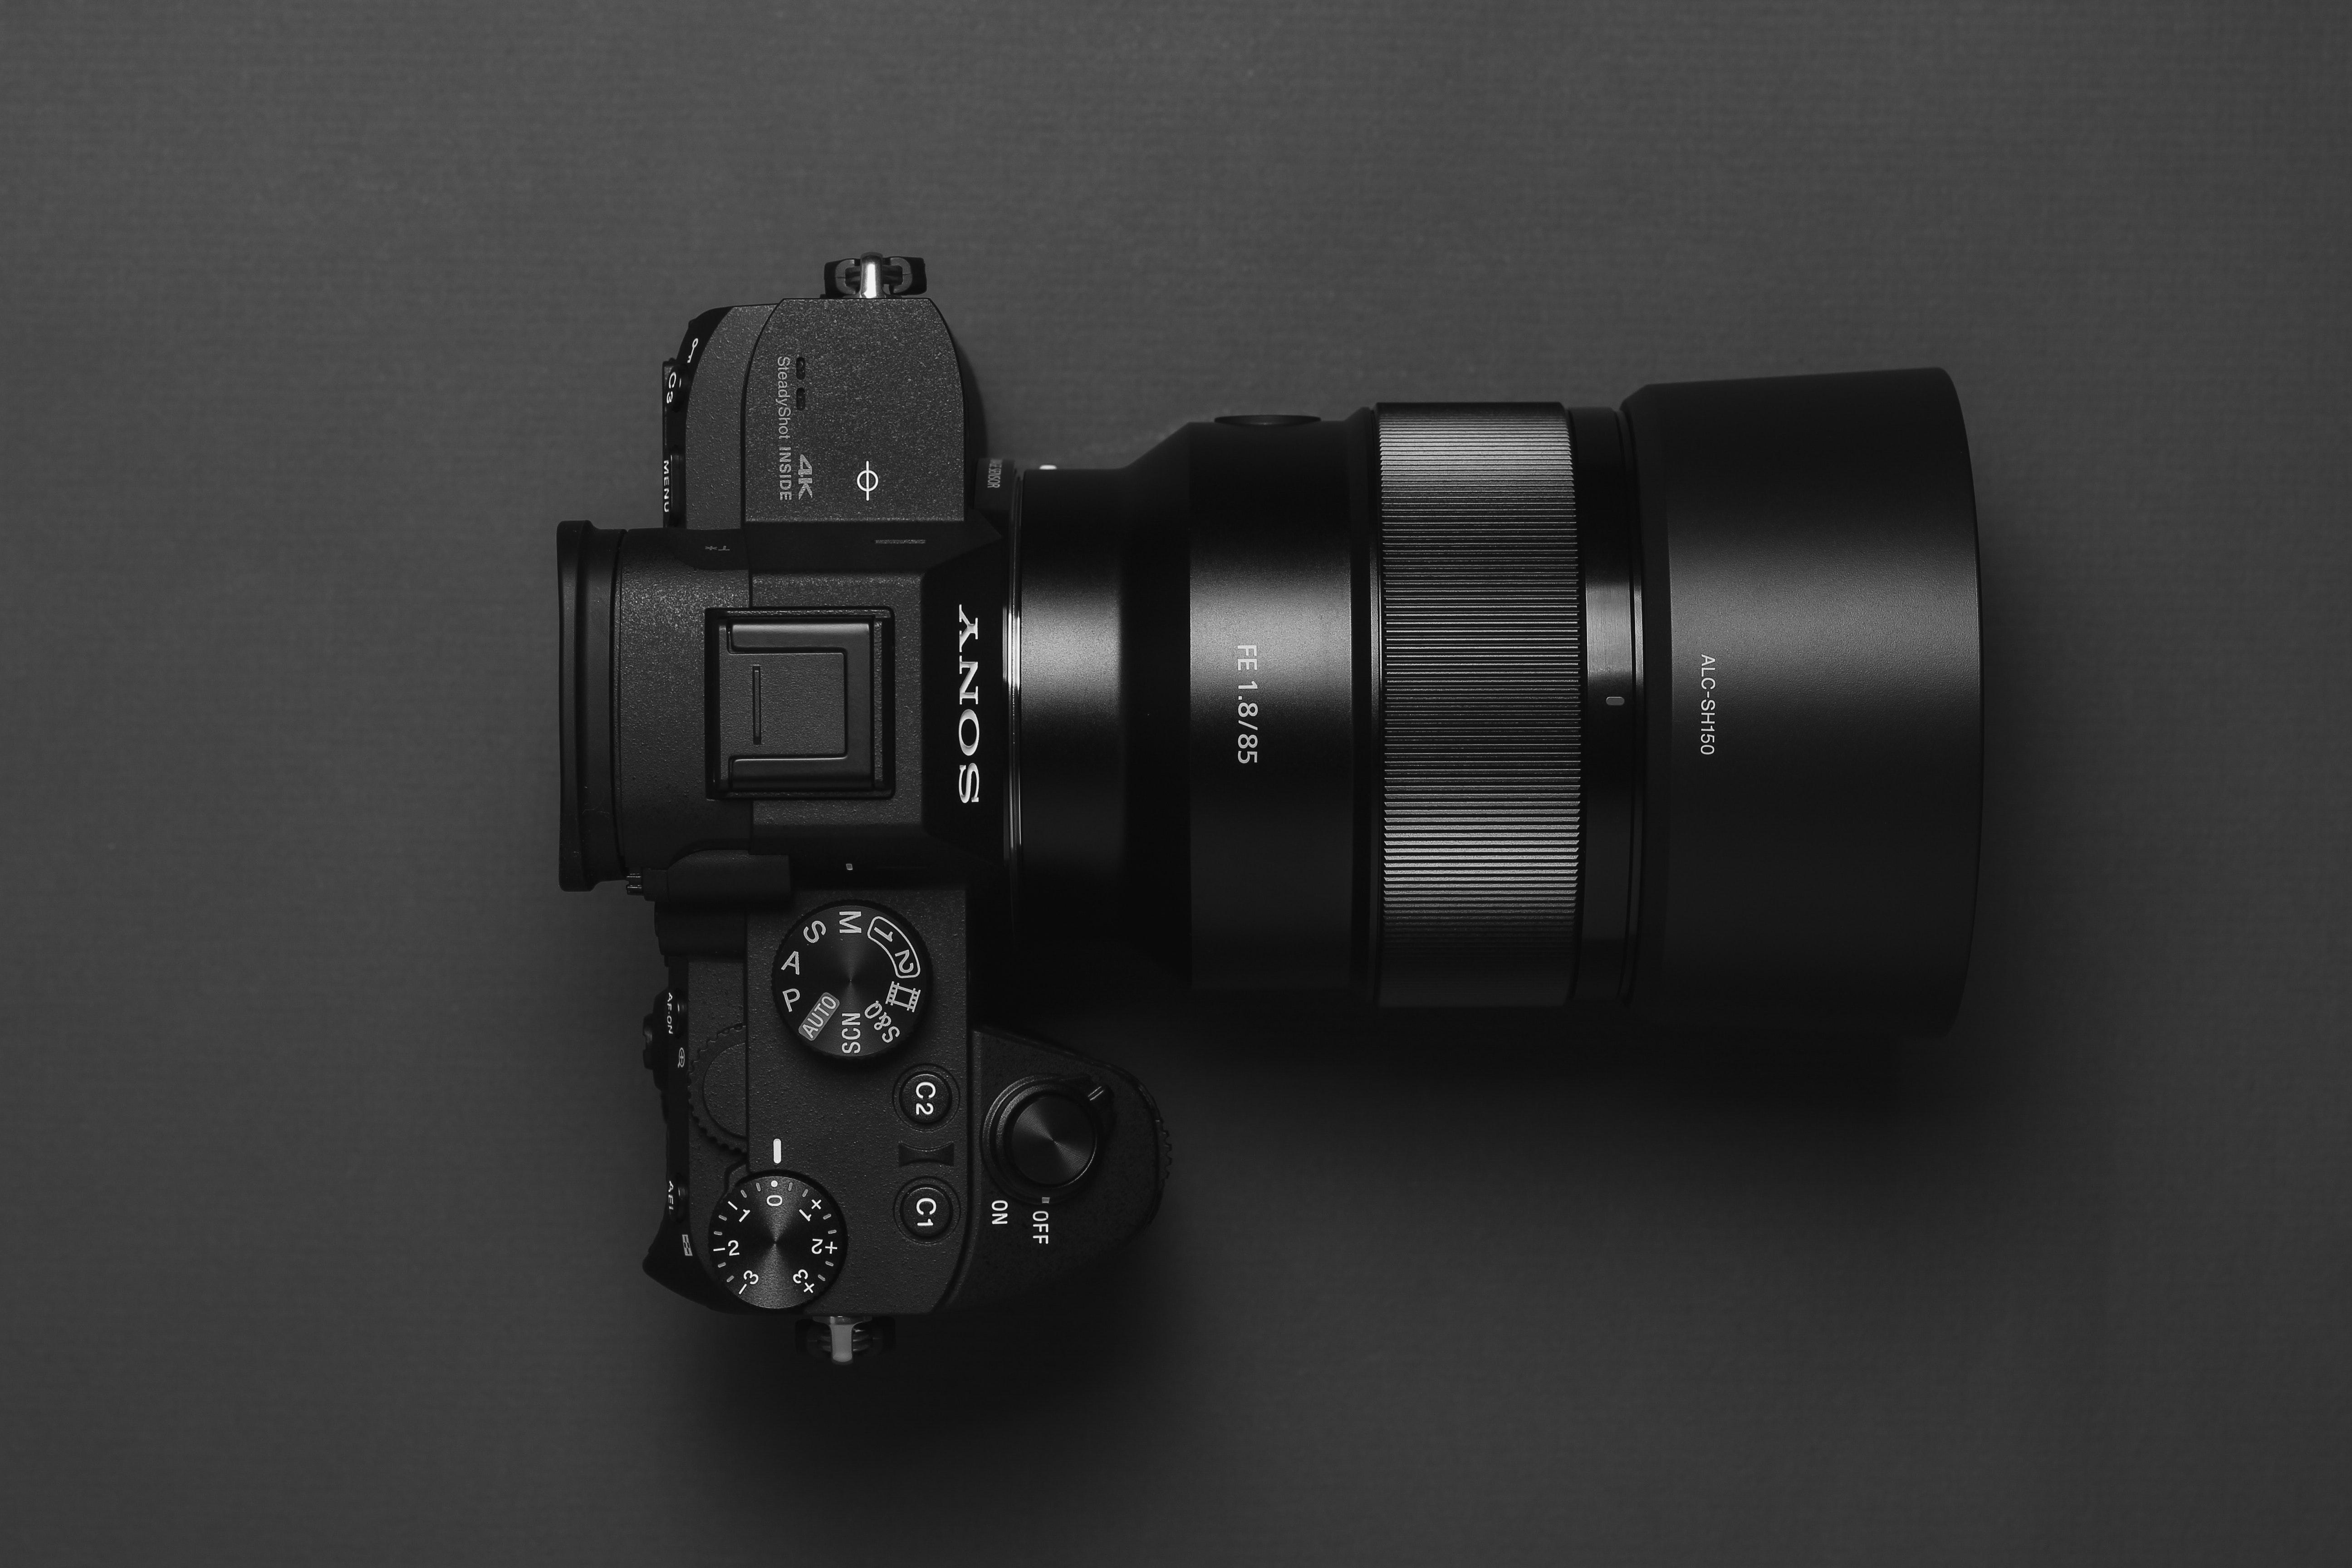 Digital camera modes wheel